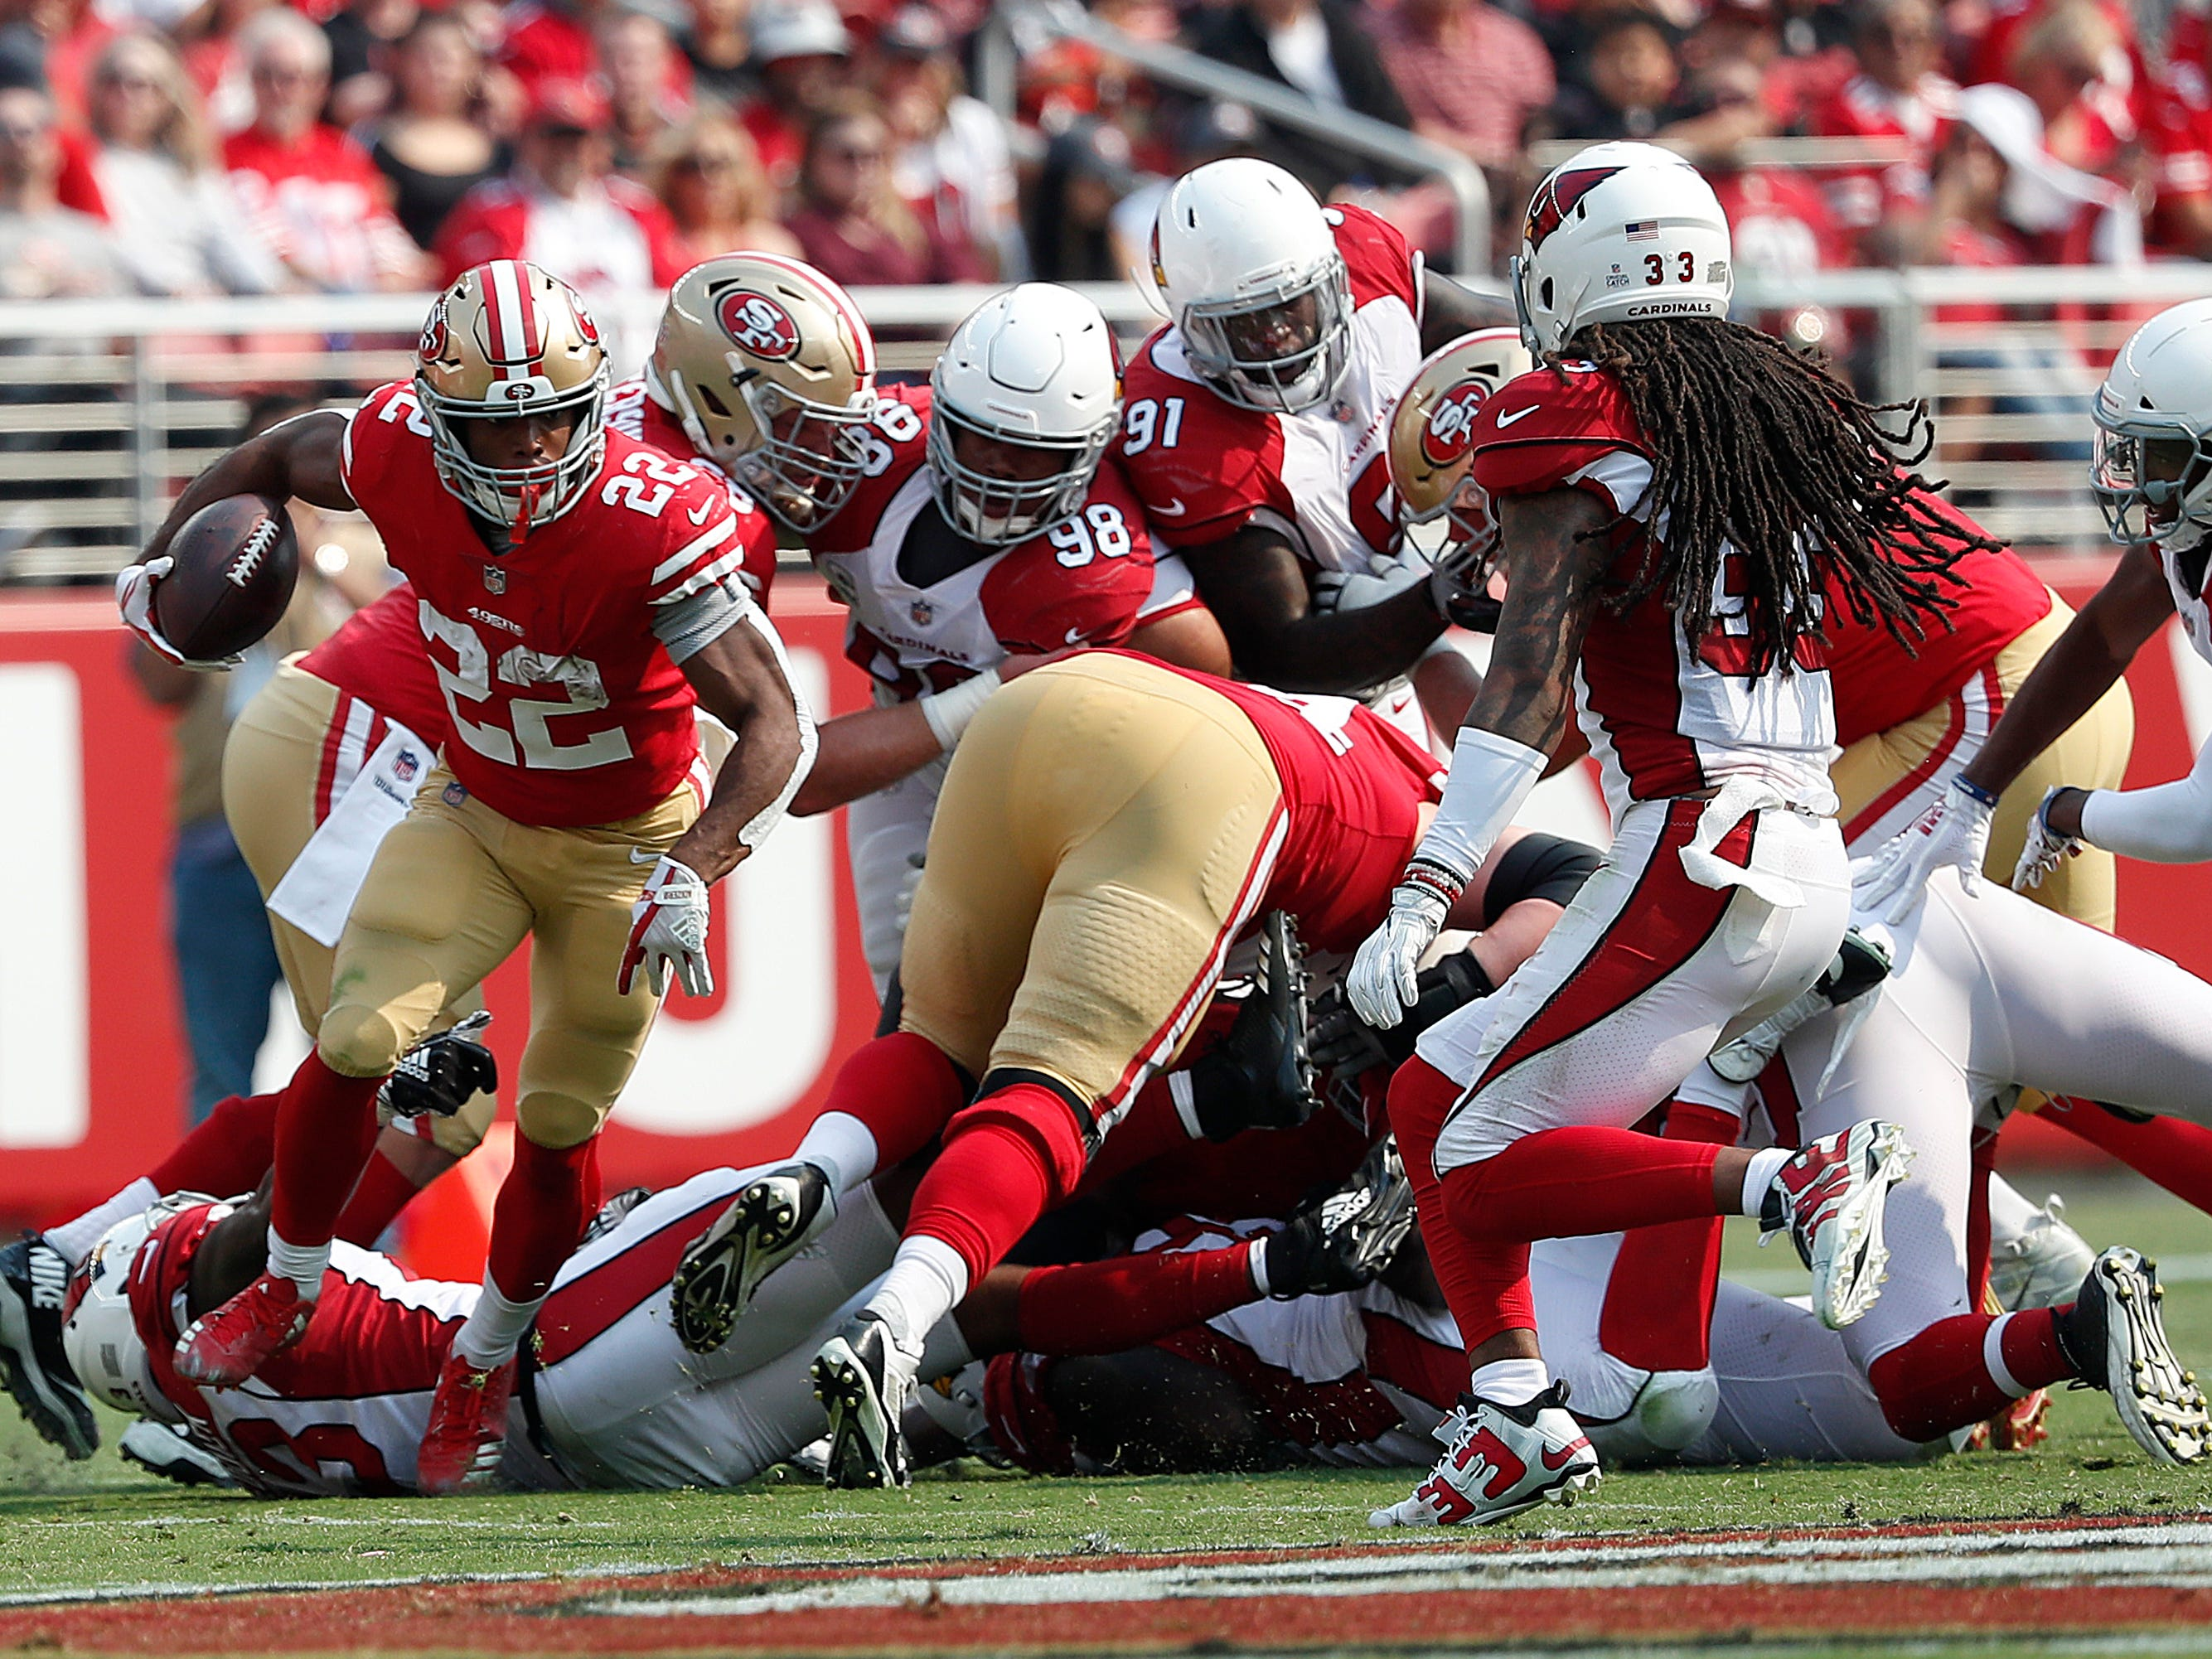 San Francisco 49ers running back Matt Breida (22) runs against the Arizona Cardinals during the first half of an NFL football game in Santa Clara, Calif., Sunday, Oct. 7, 2018.